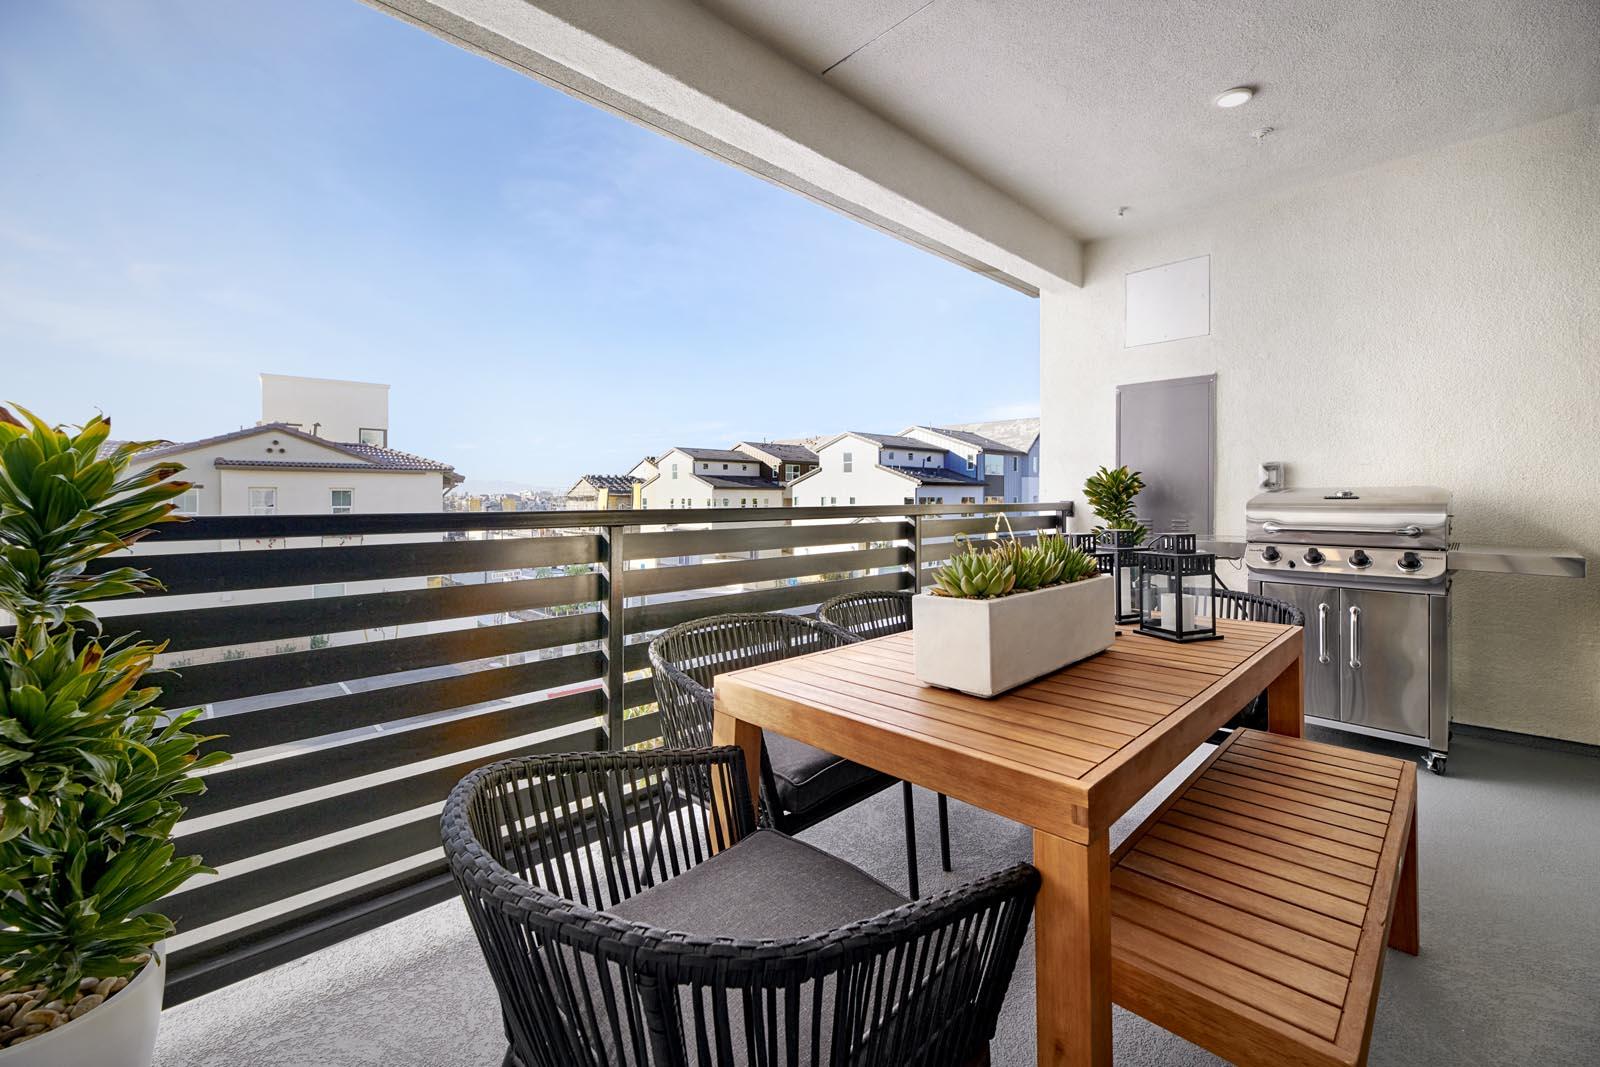 Deck | Residence 5 | Aspire | New Homes in Rancho Cucamonga, CA | Van Daele Homes